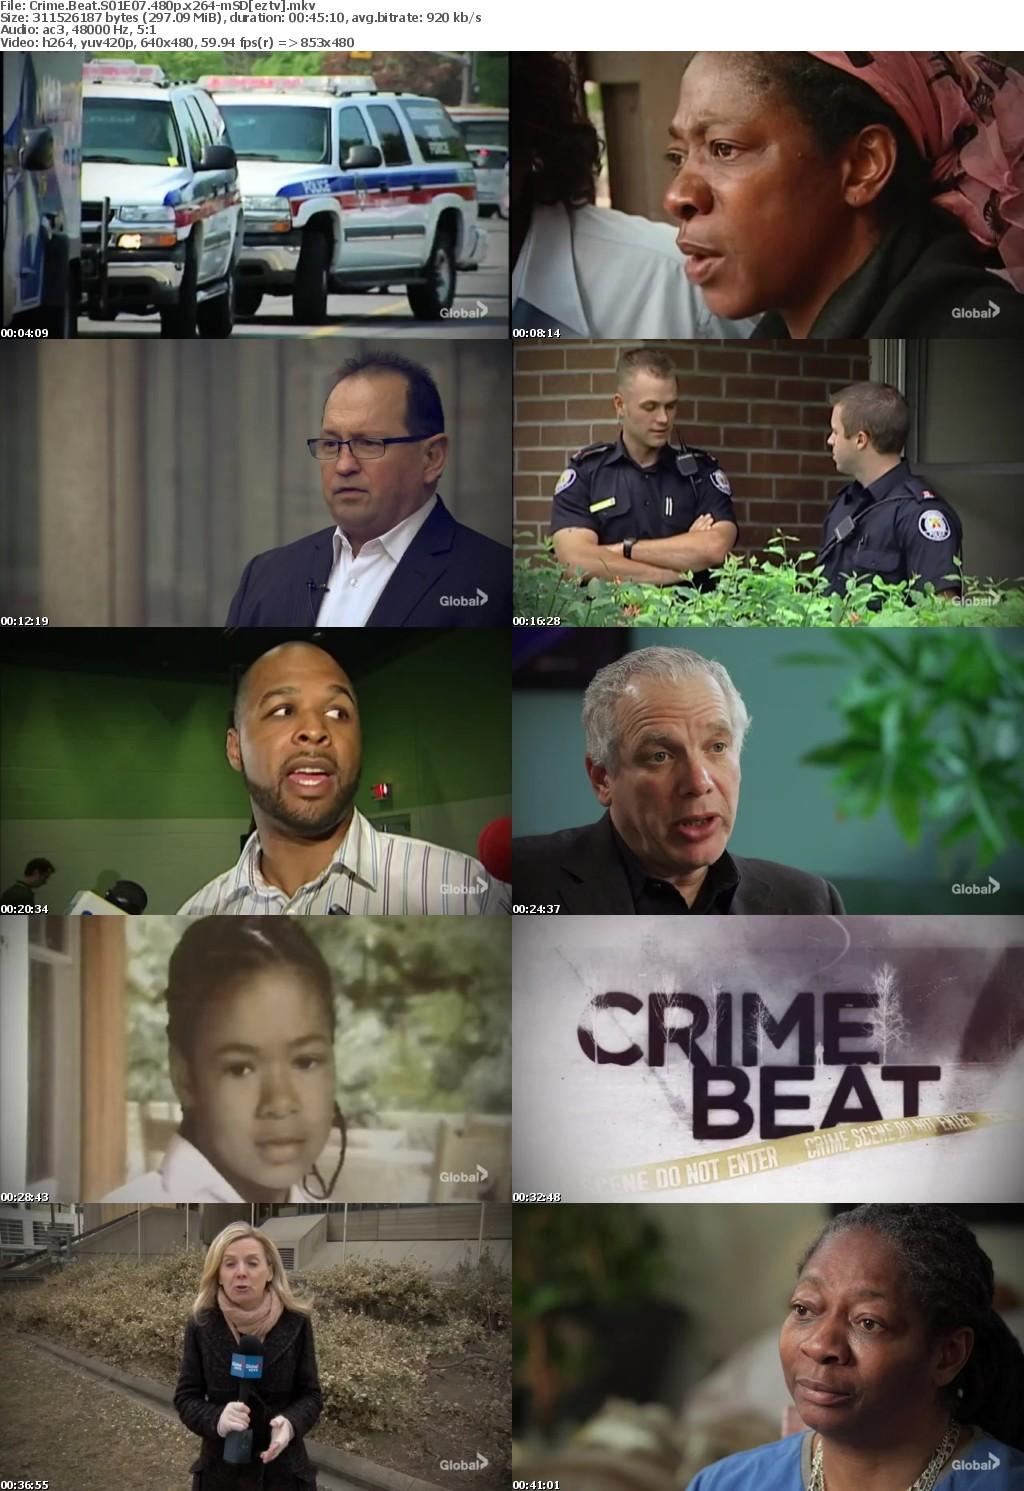 Crime Beat S01E07 480p x264-mSD